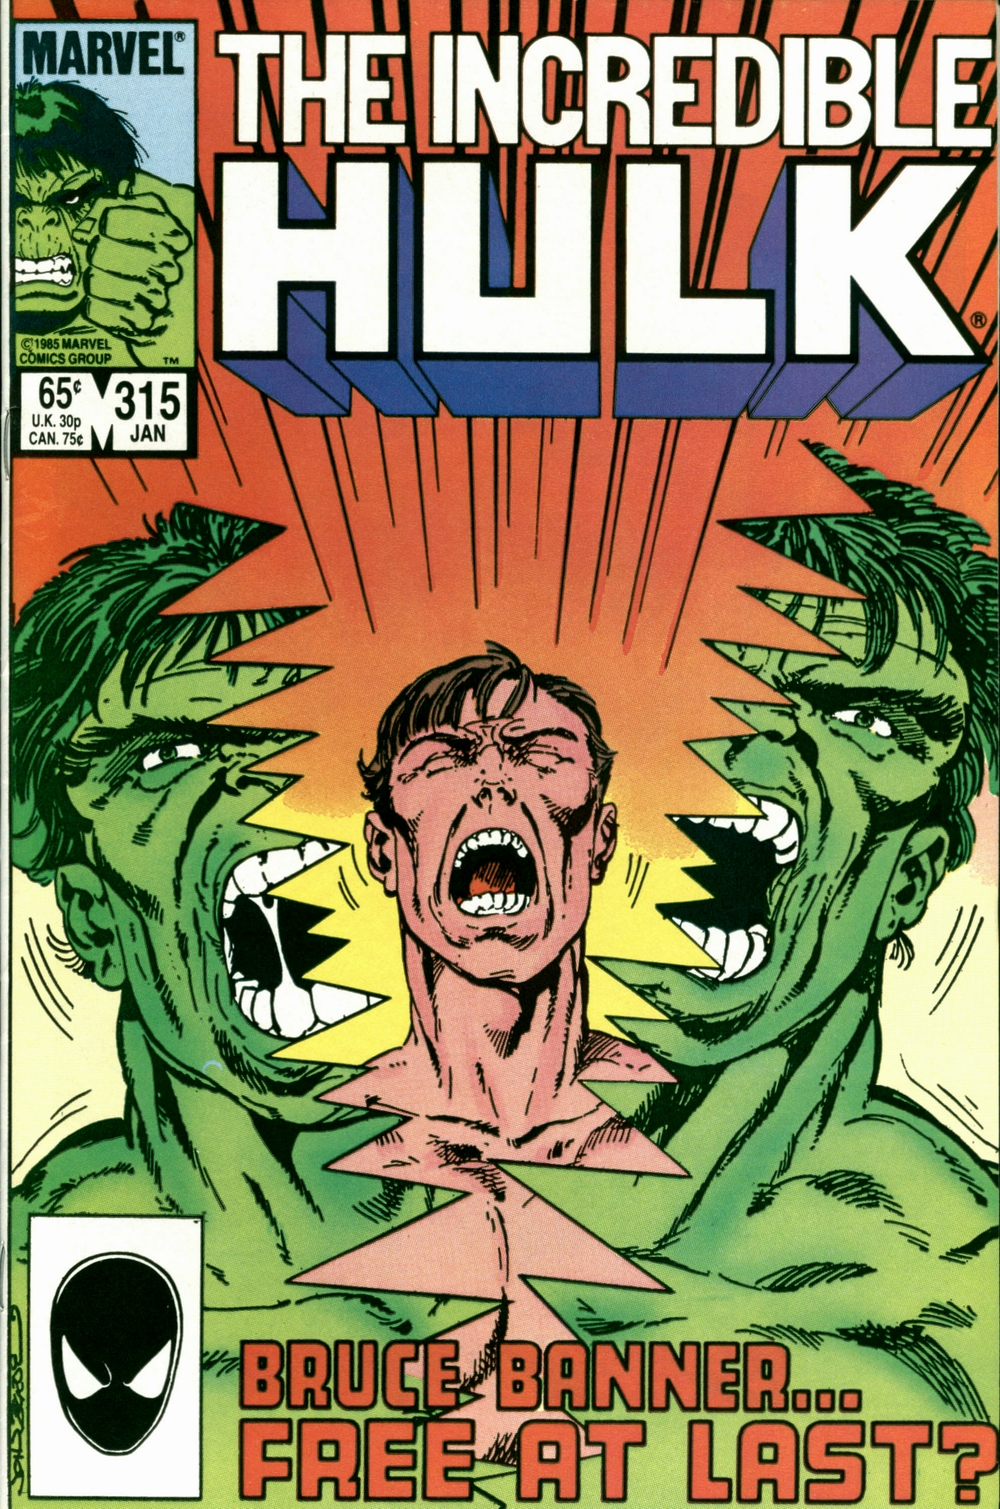 The Incredible Hulk #181 Comic Book Values